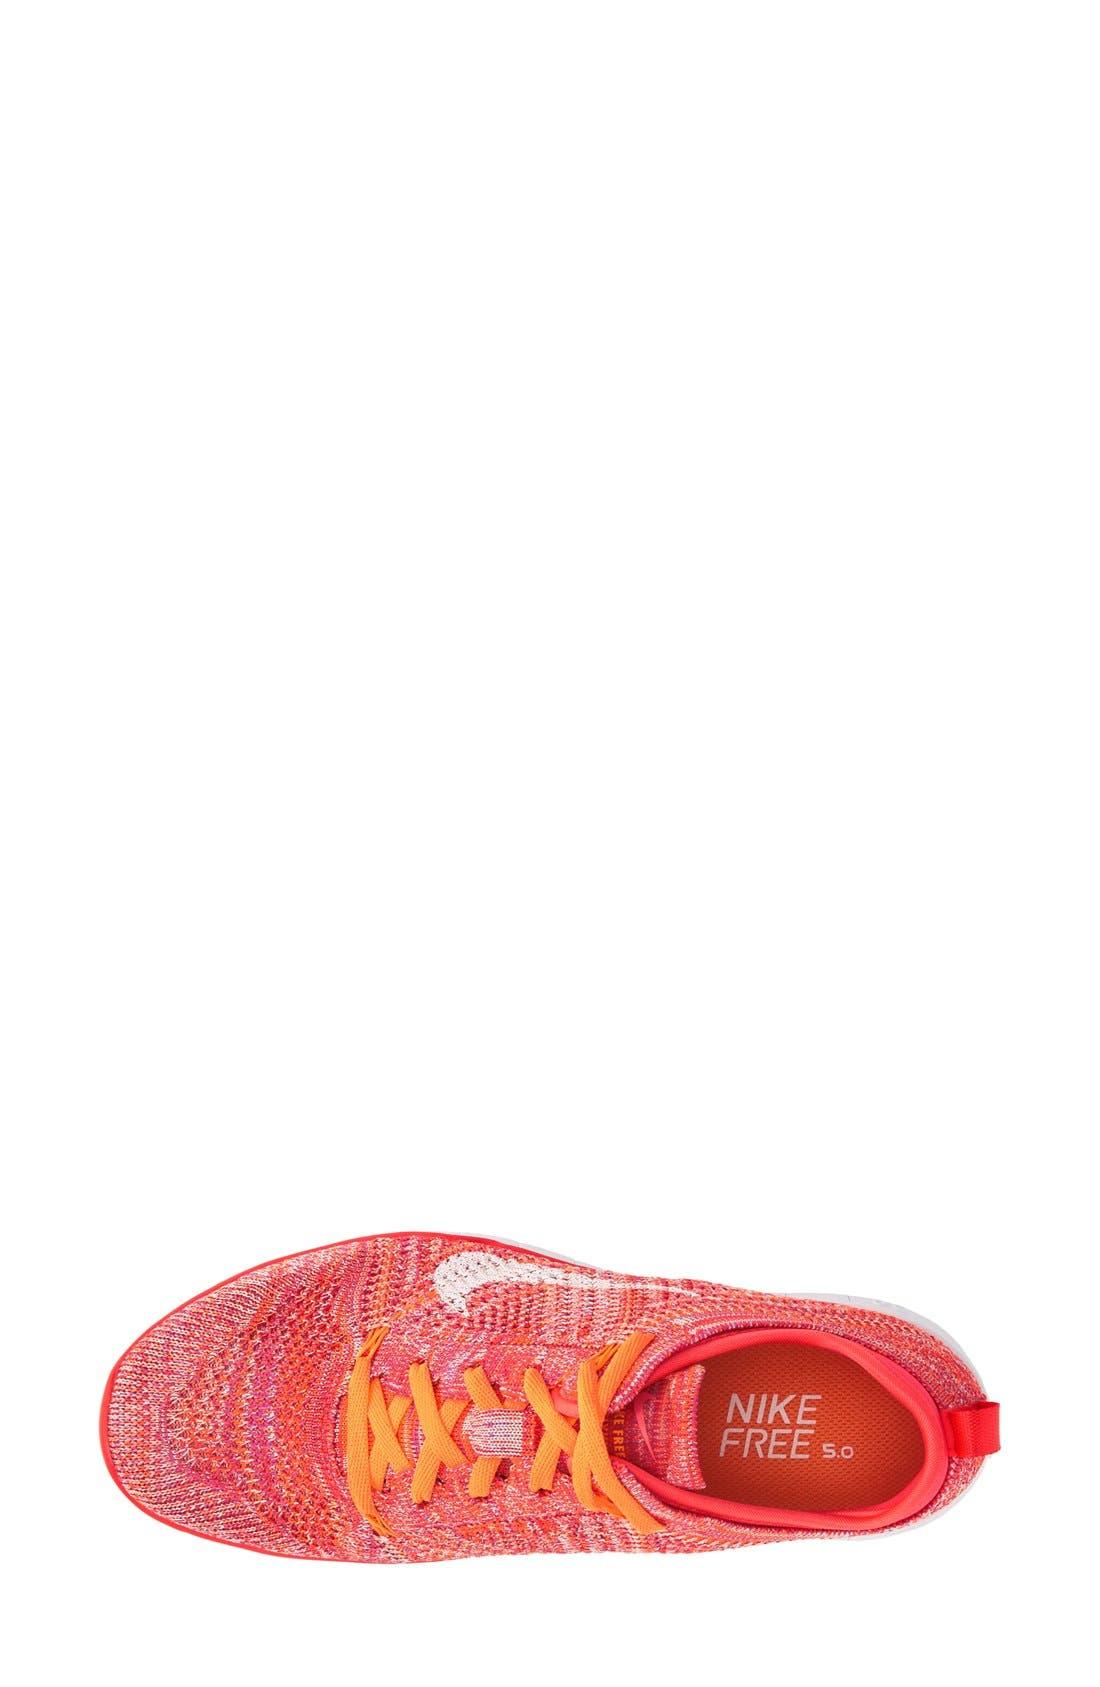 ,                             'Free Flyknit 5.0 TR' Training Shoe,                             Alternate thumbnail 50, color,                             600